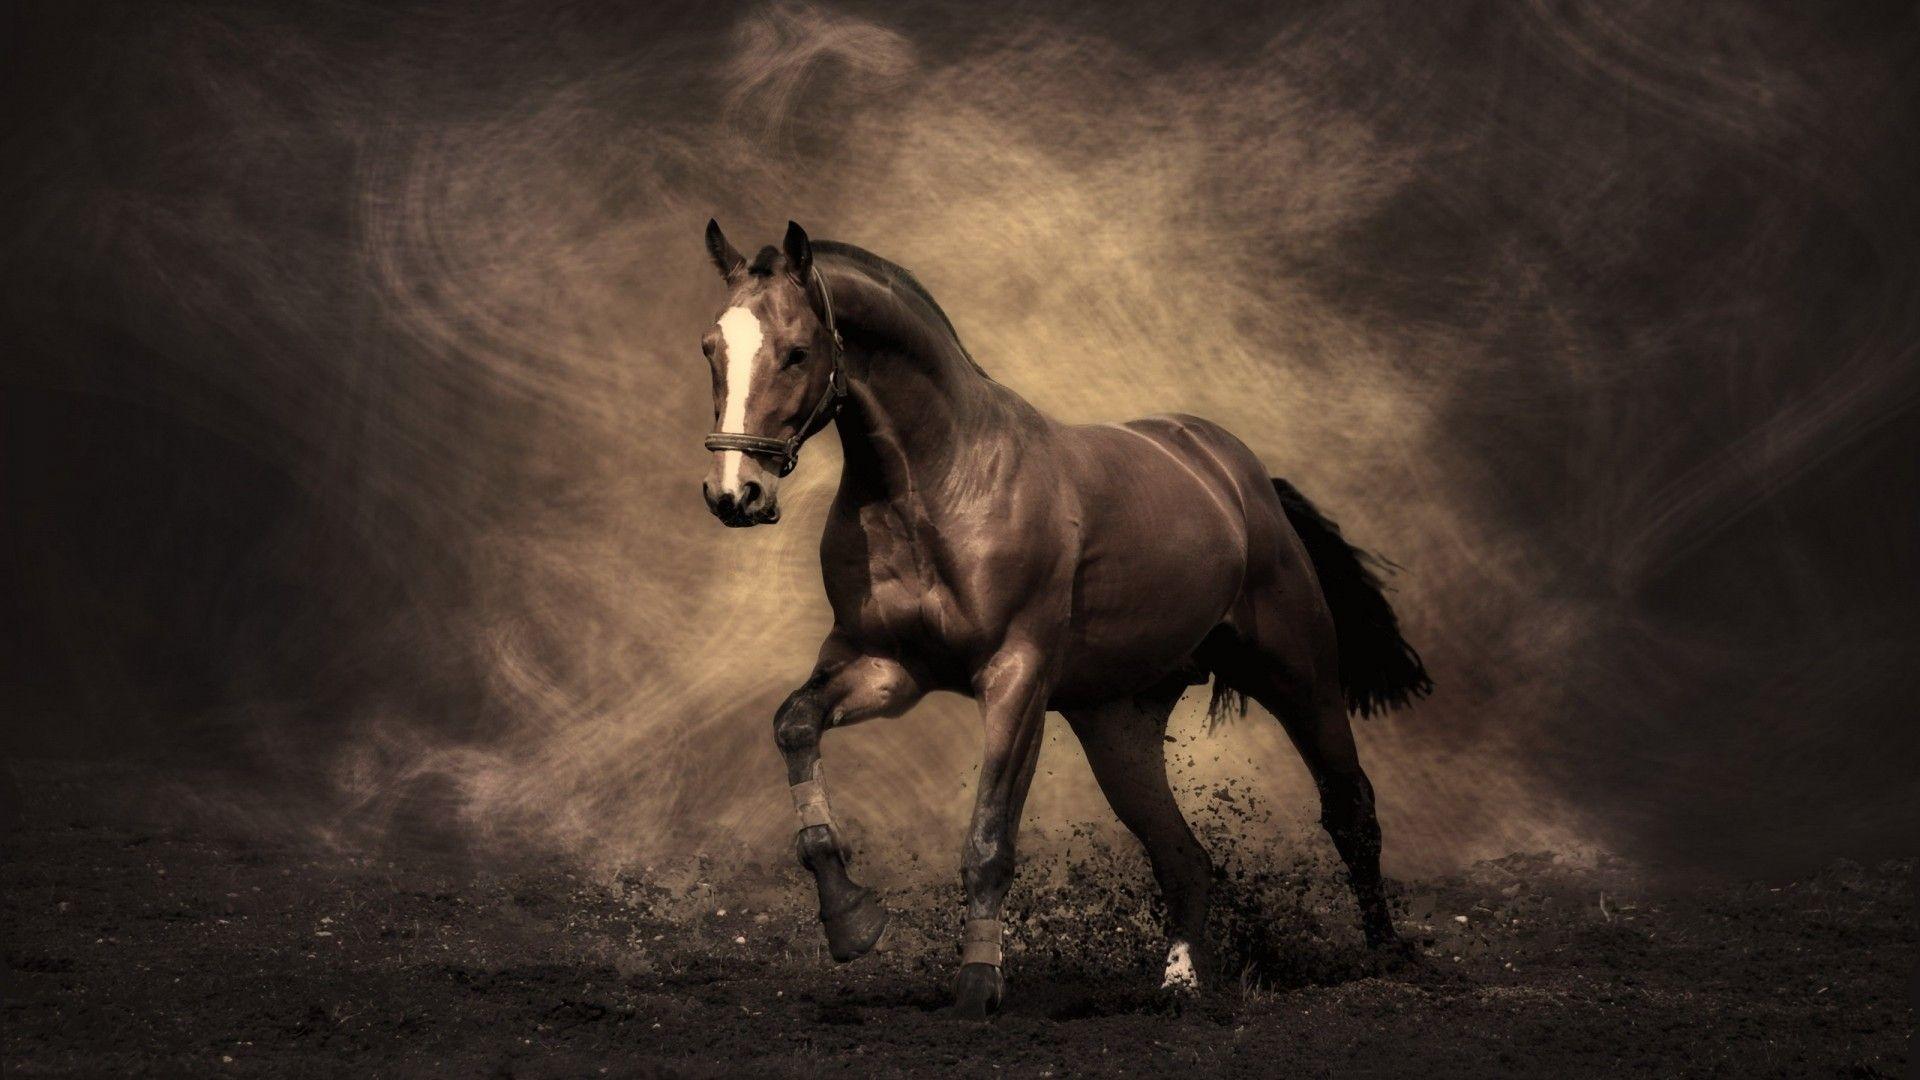 Arabian Racing Horse Desktop | High Quality Wallpapers,Wallpaper .